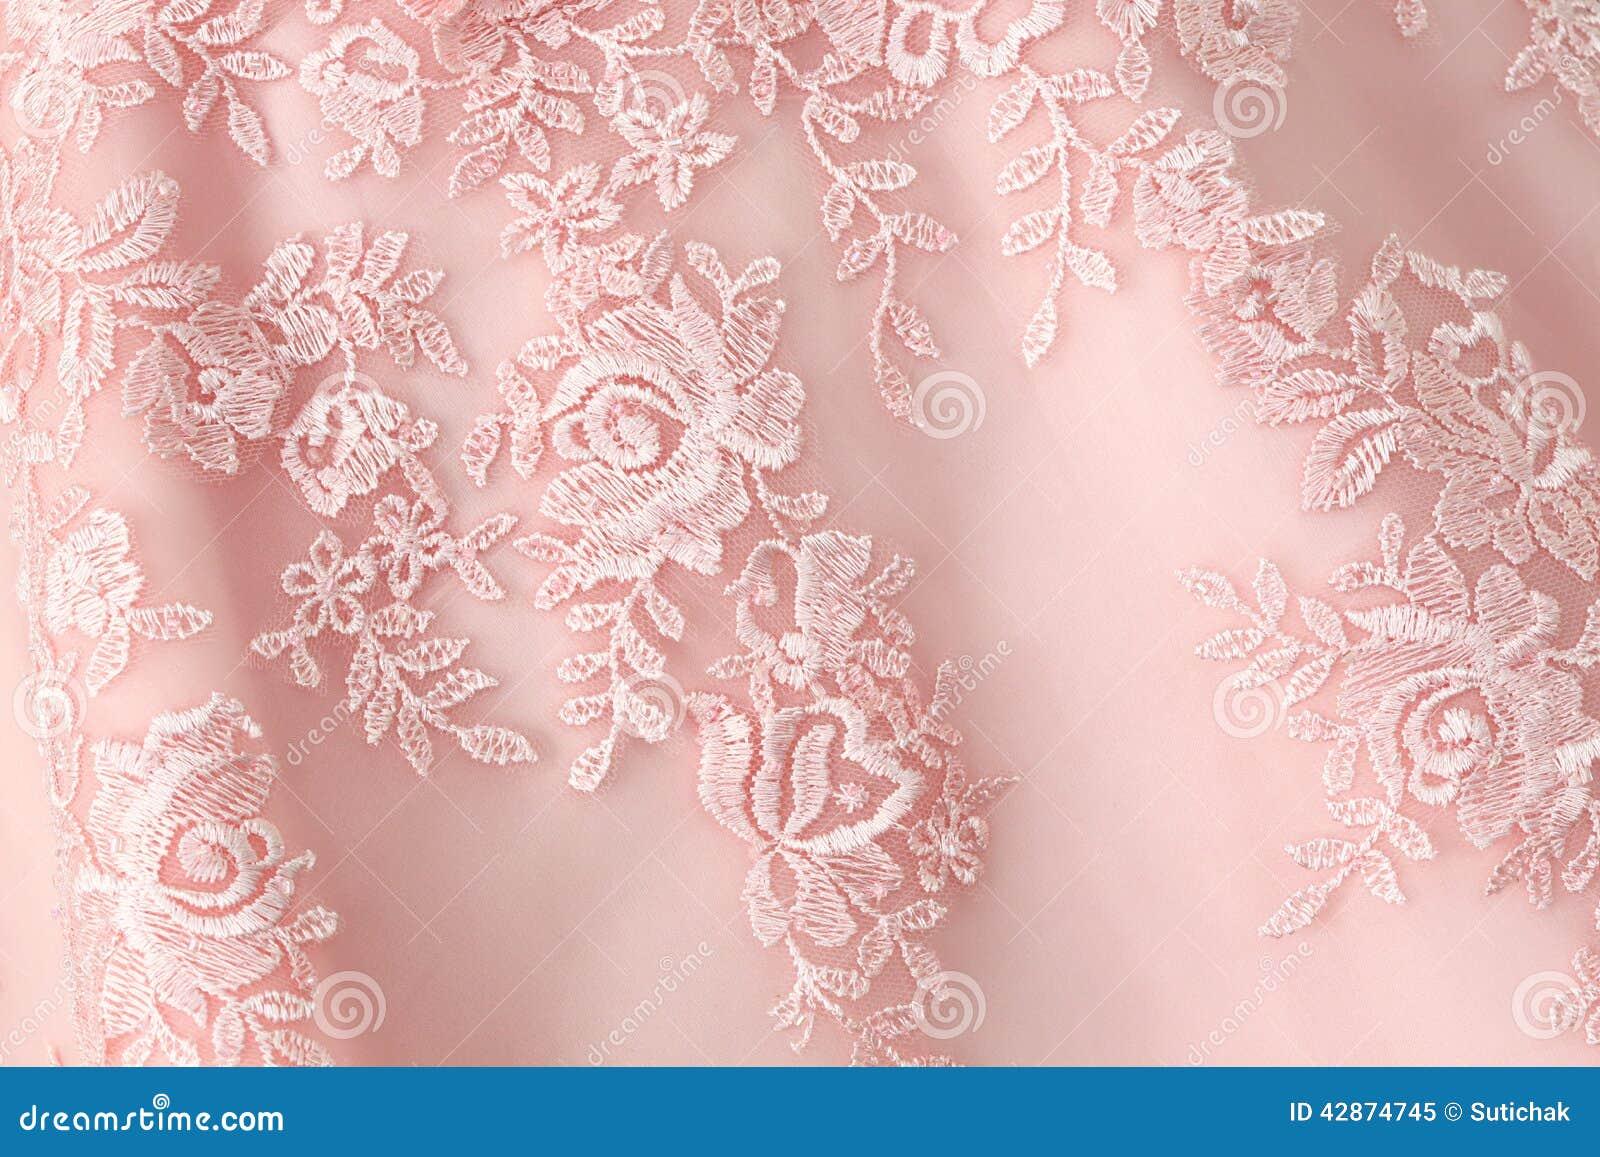 Vistoso Vestido De Boda Arte Imagen - Colección de Vestidos de Boda ...